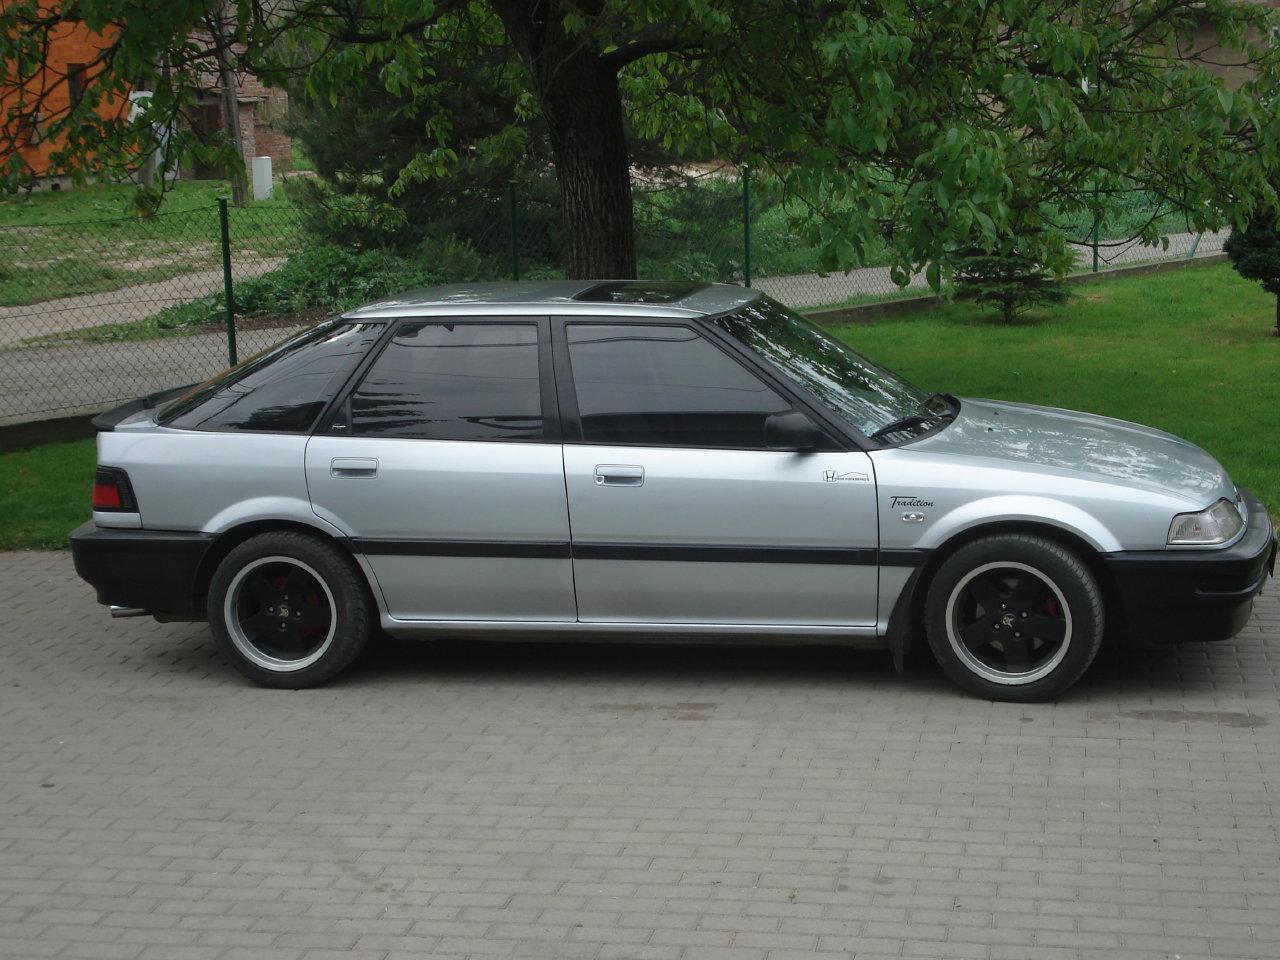 Honda Concerto, samochody z lat 90, zdjęcia, czarne felgi